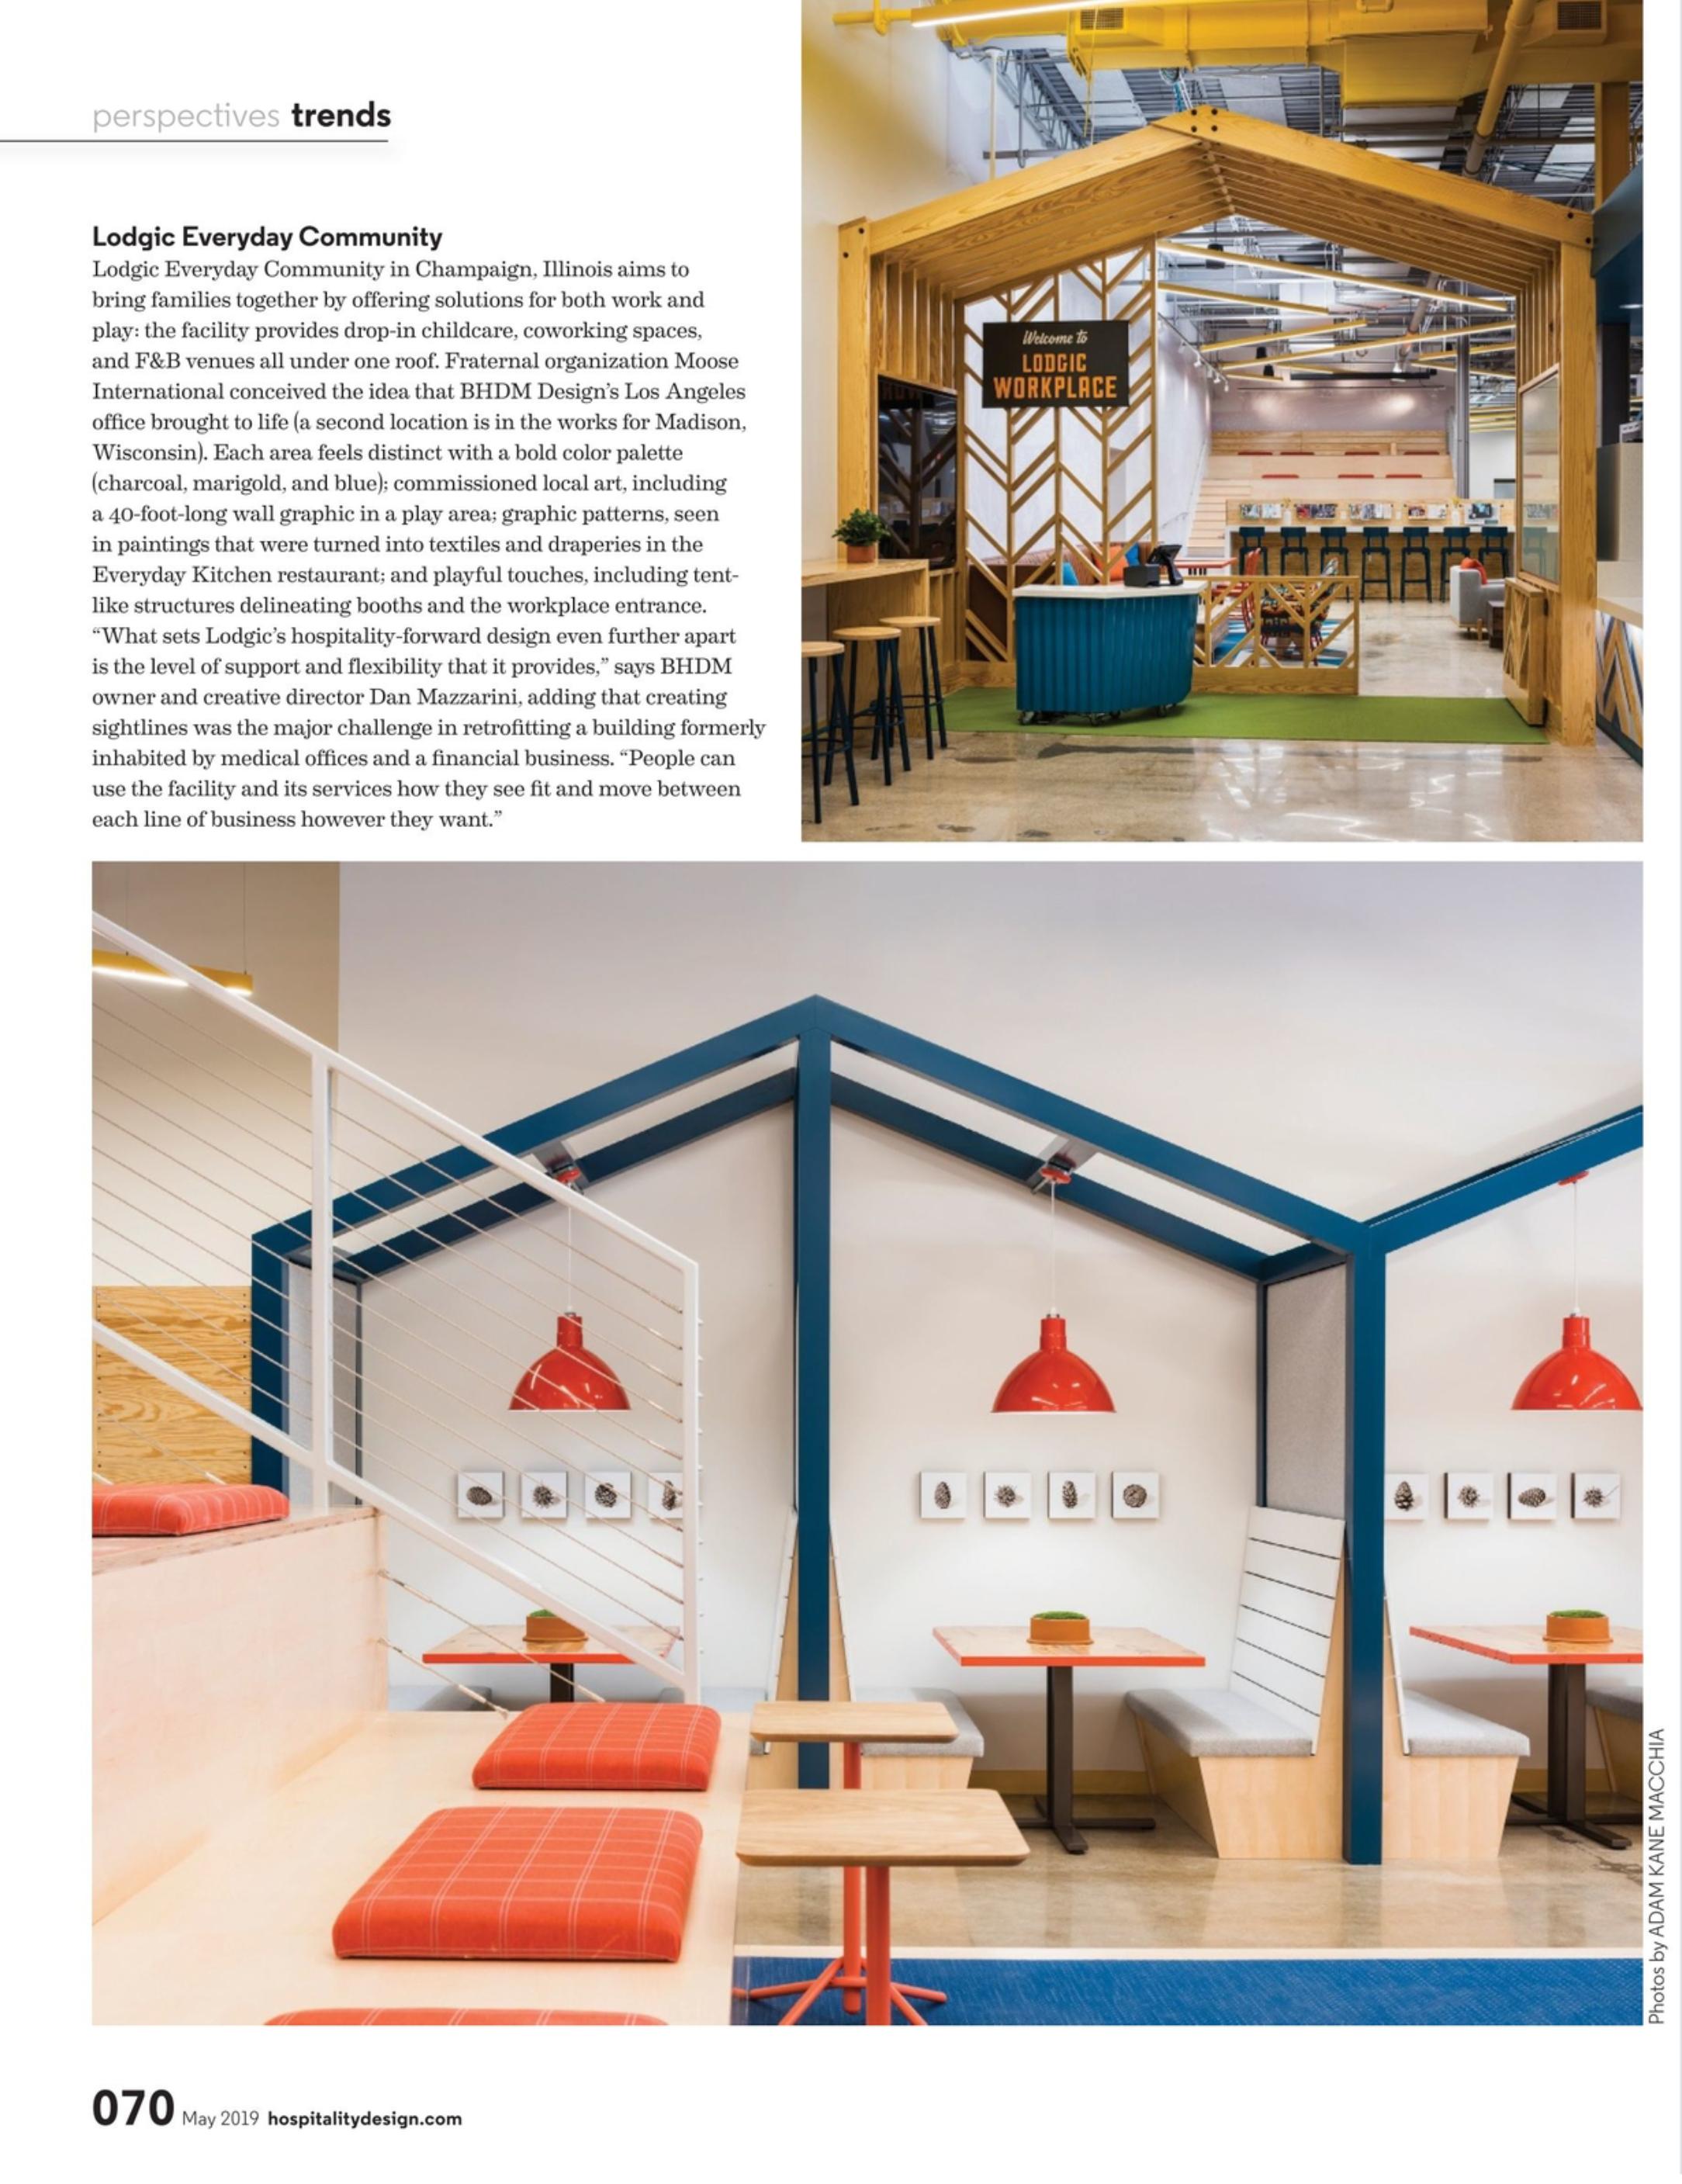 Hospitality Design - May 2019-LODGIC.jpg